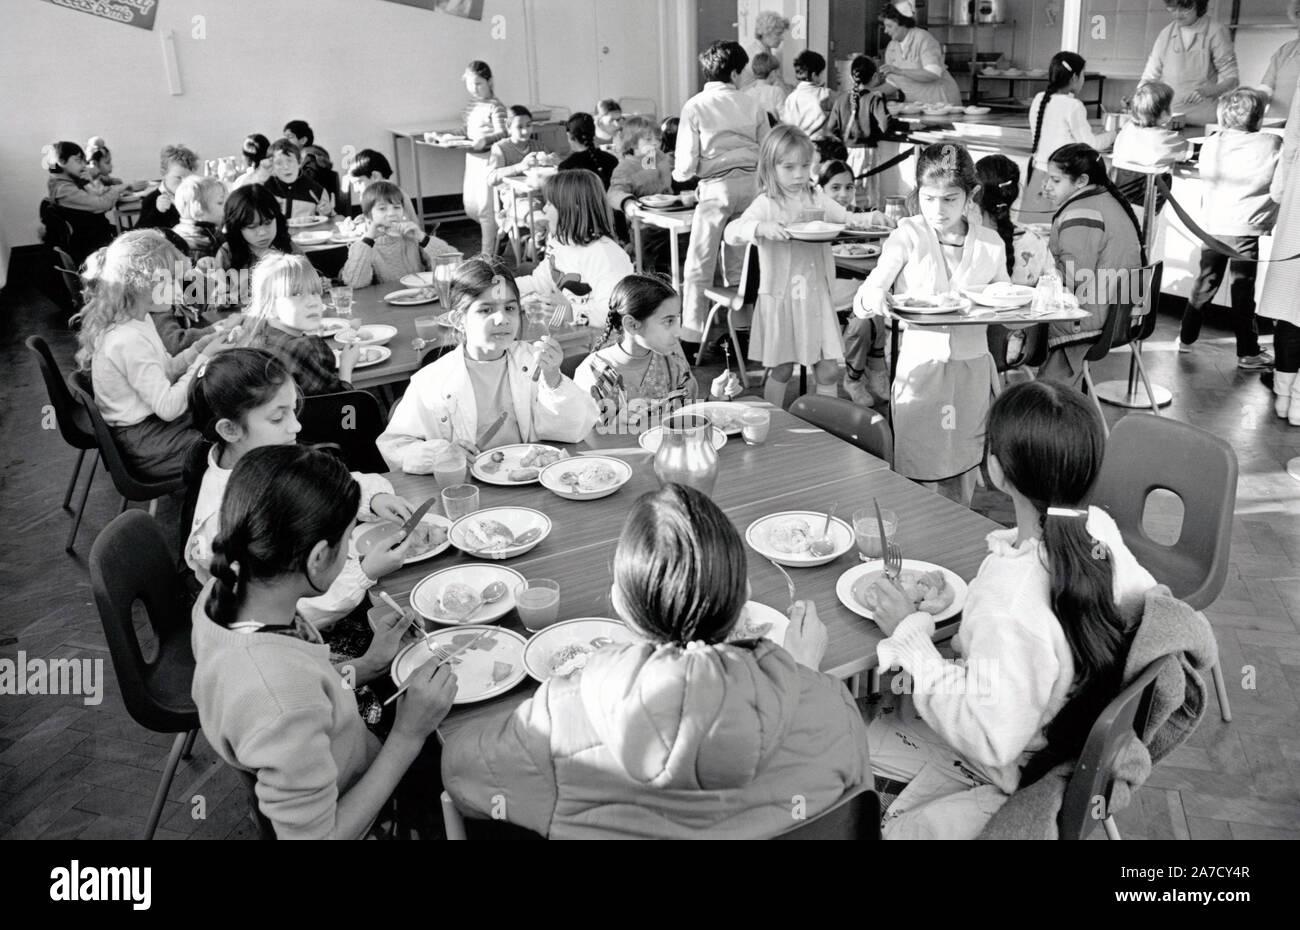 School dinners, Stanley Junior School, Nottingham November 1986 UK Stock Photo